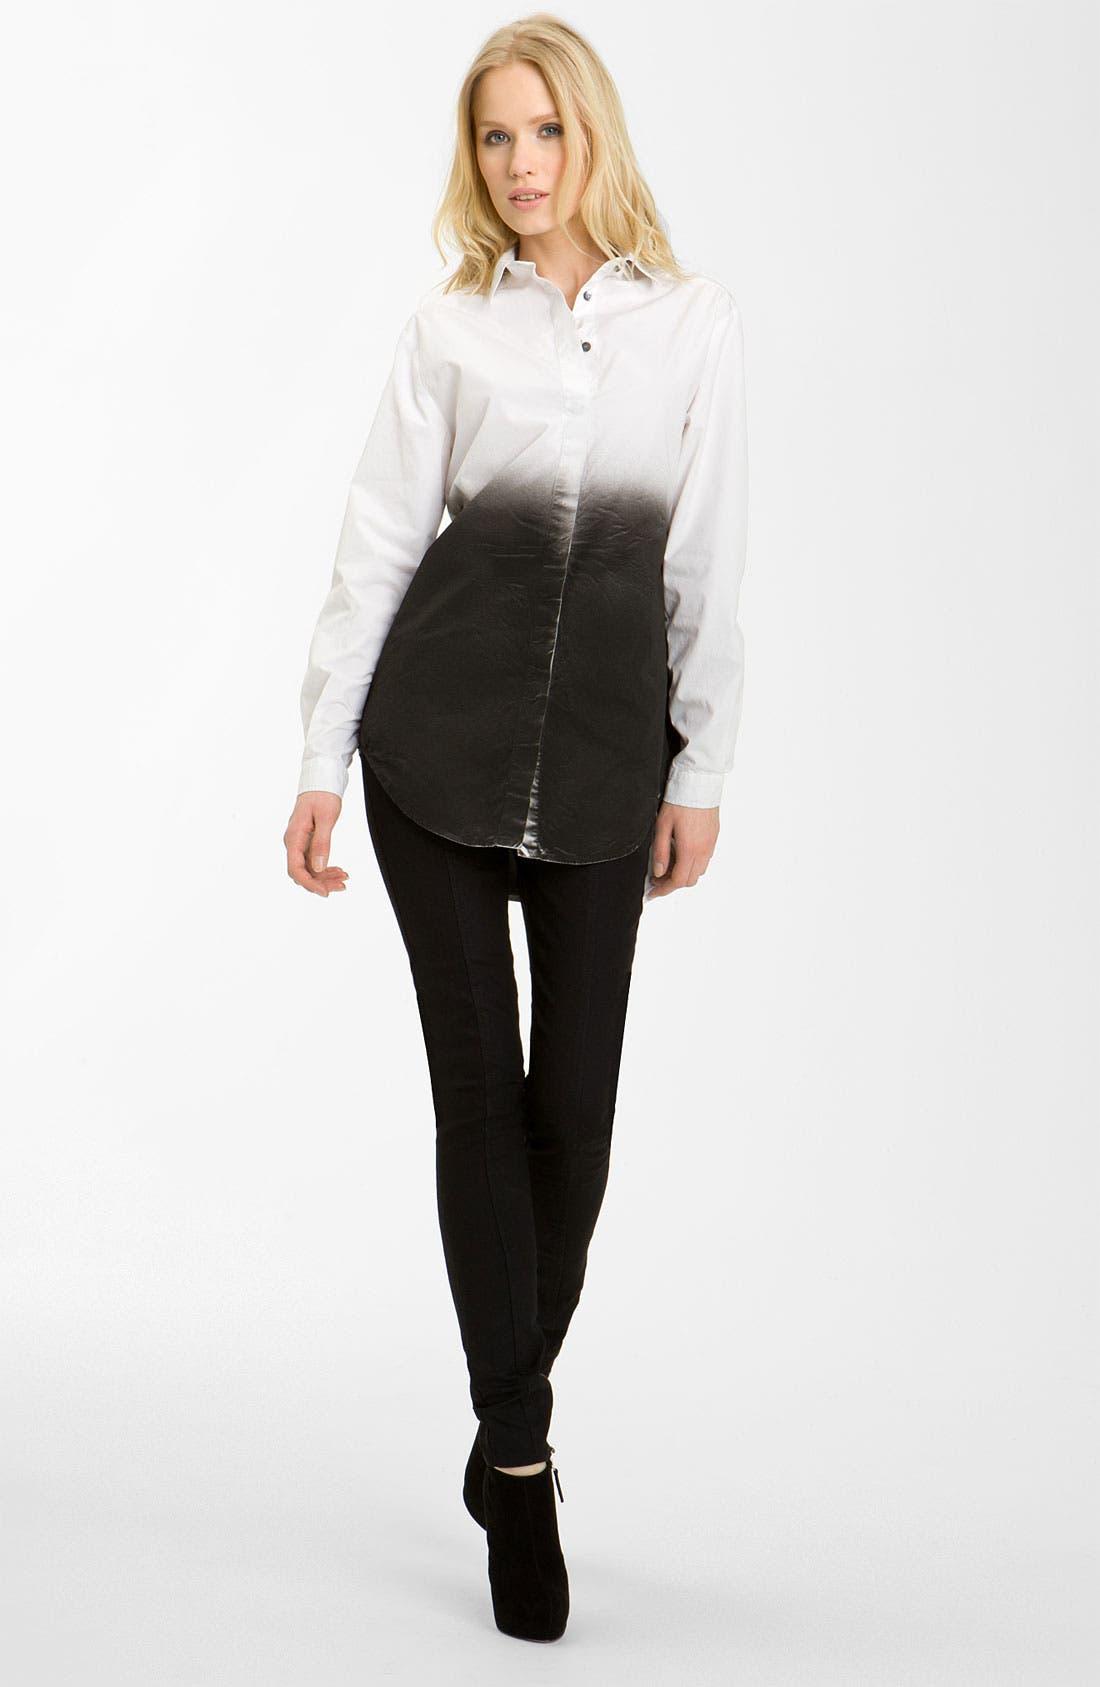 Alternate Image 1 Selected - Pierre Balmain Ombré Shirtdress